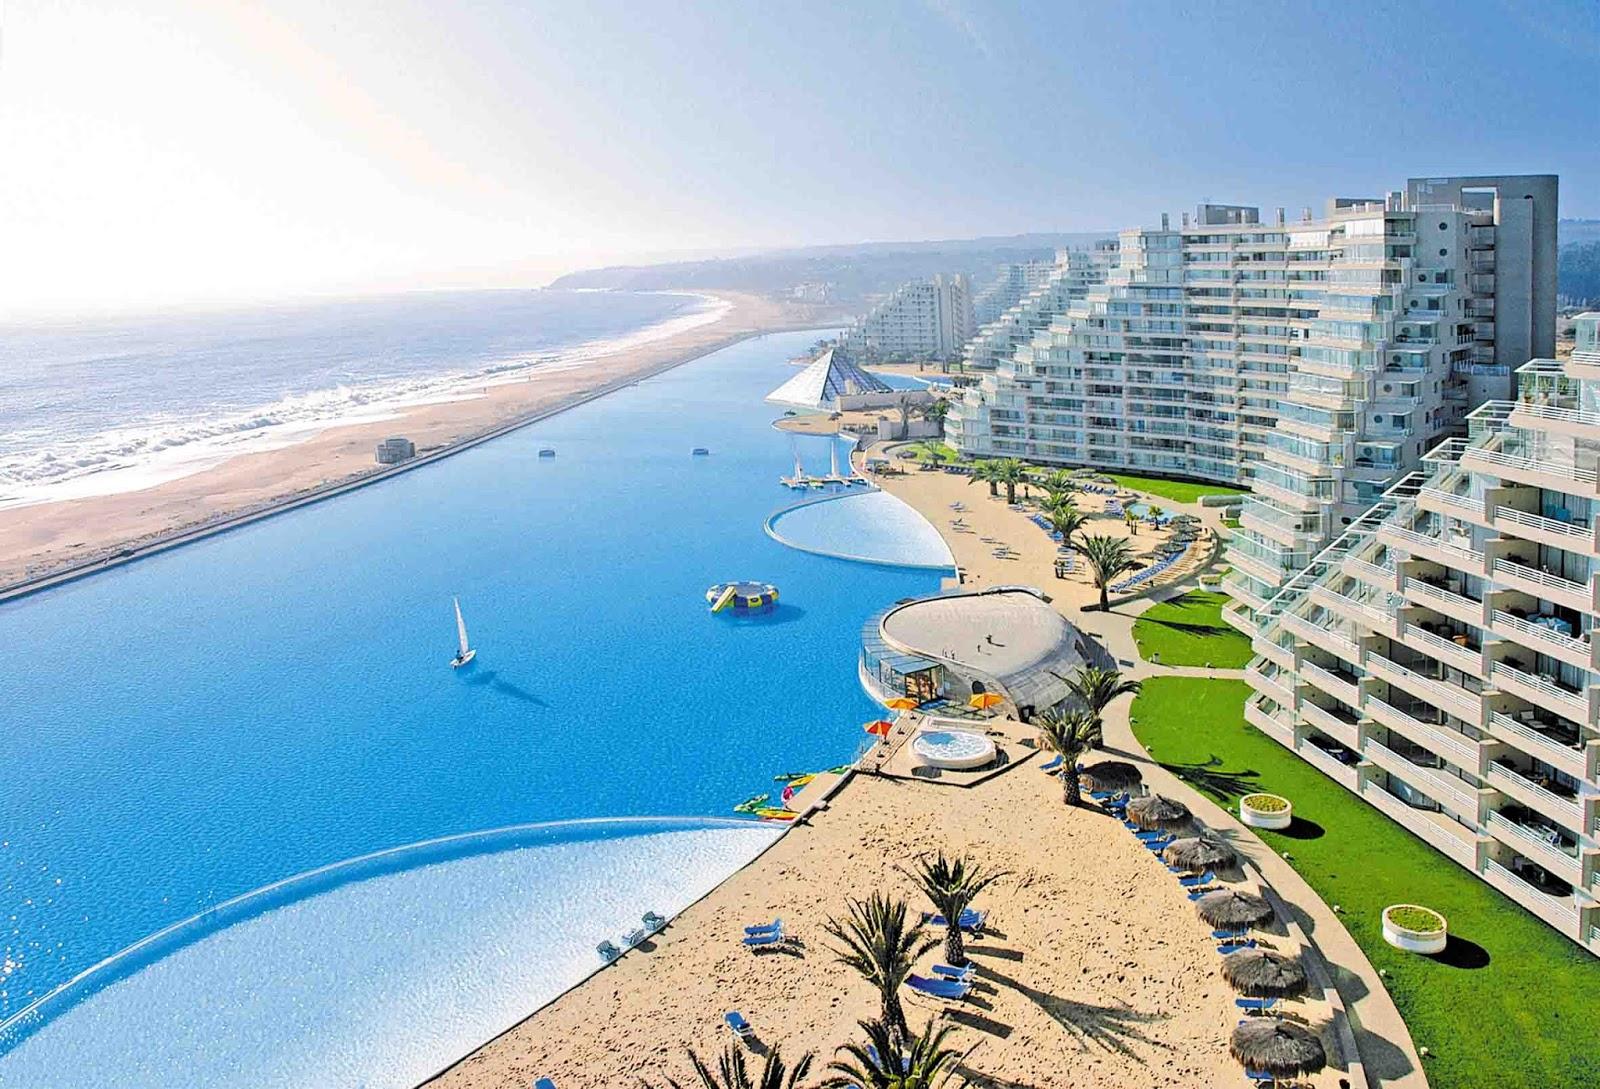 Imagenes ethel imagenes de hoteles mas hermosos del mundo for Piscina chile